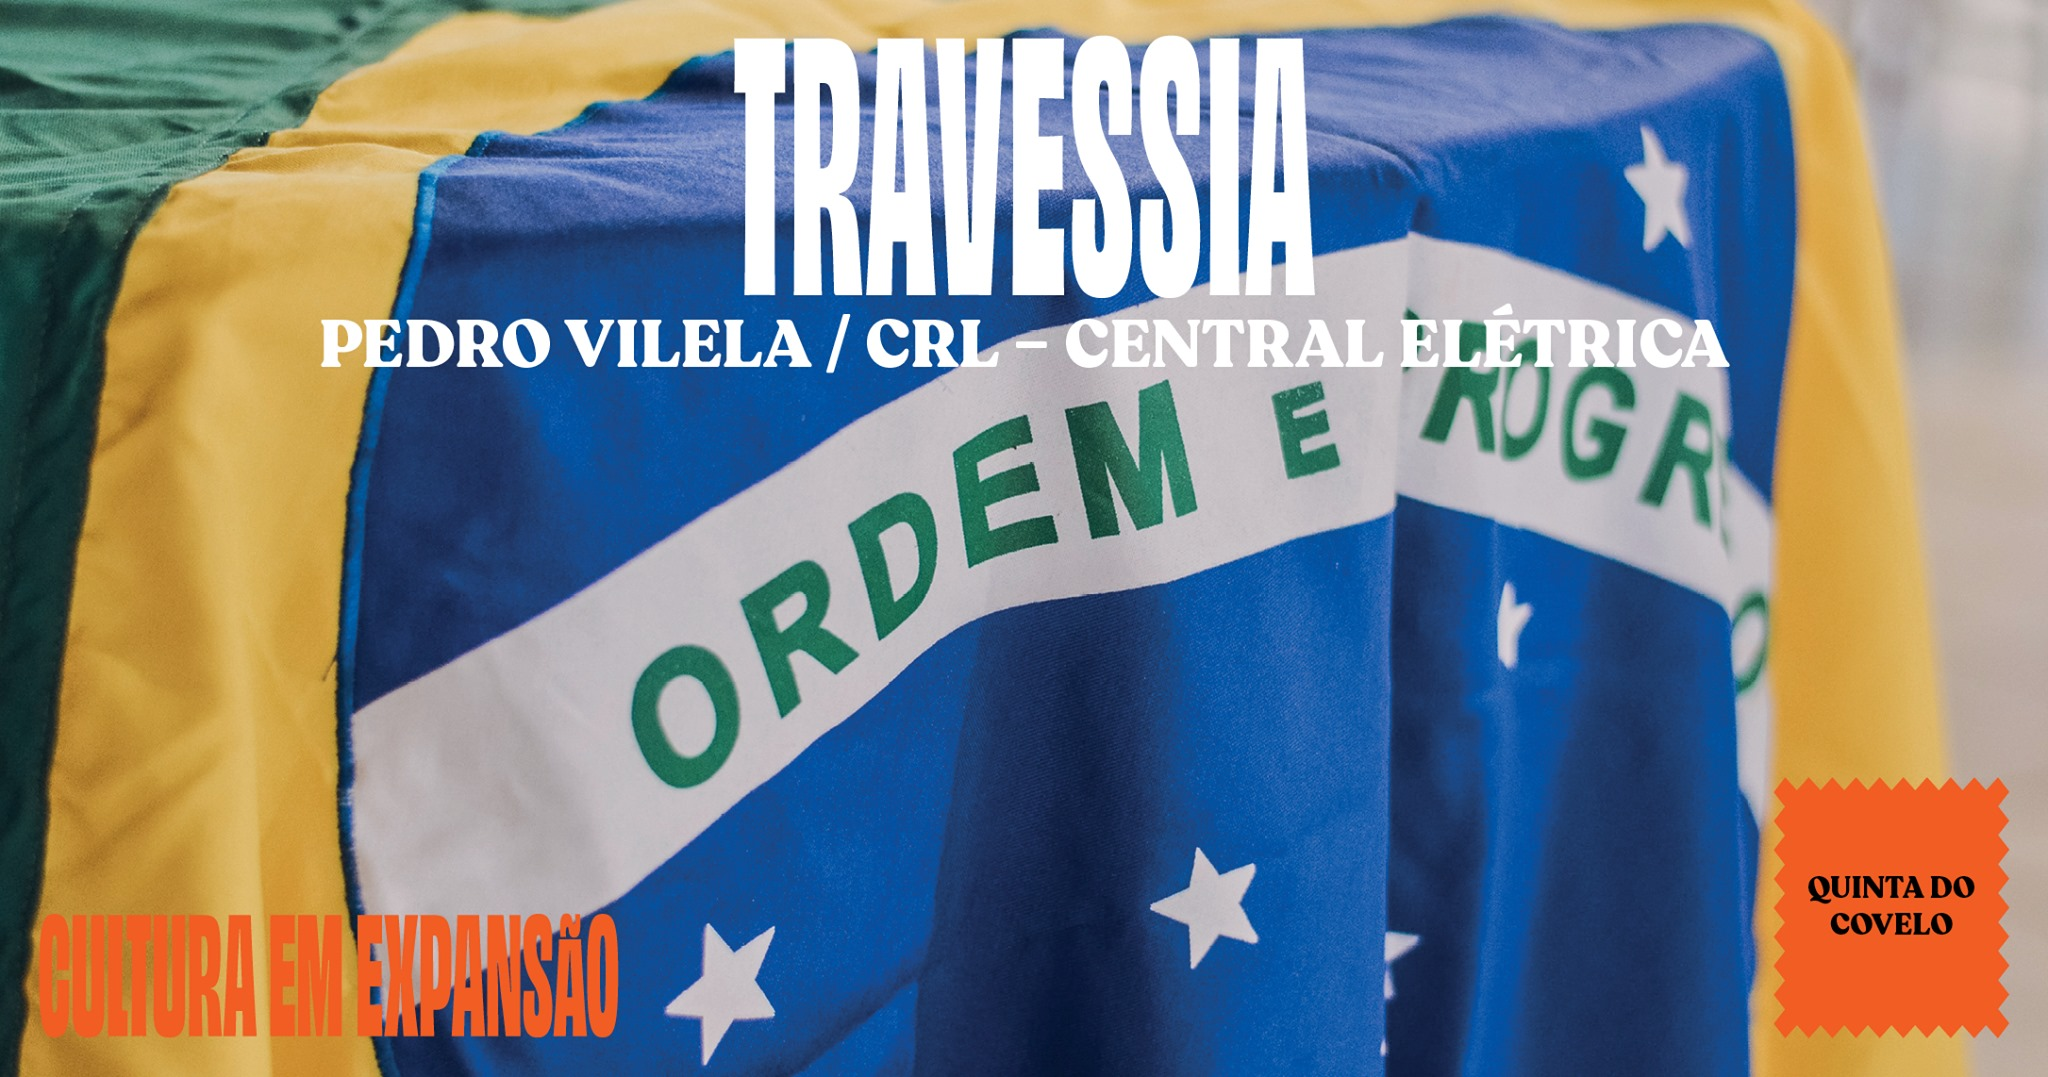 TRAVESSIA | PEDRO VILELA / CRL – CENTRAL ELÉTRICA